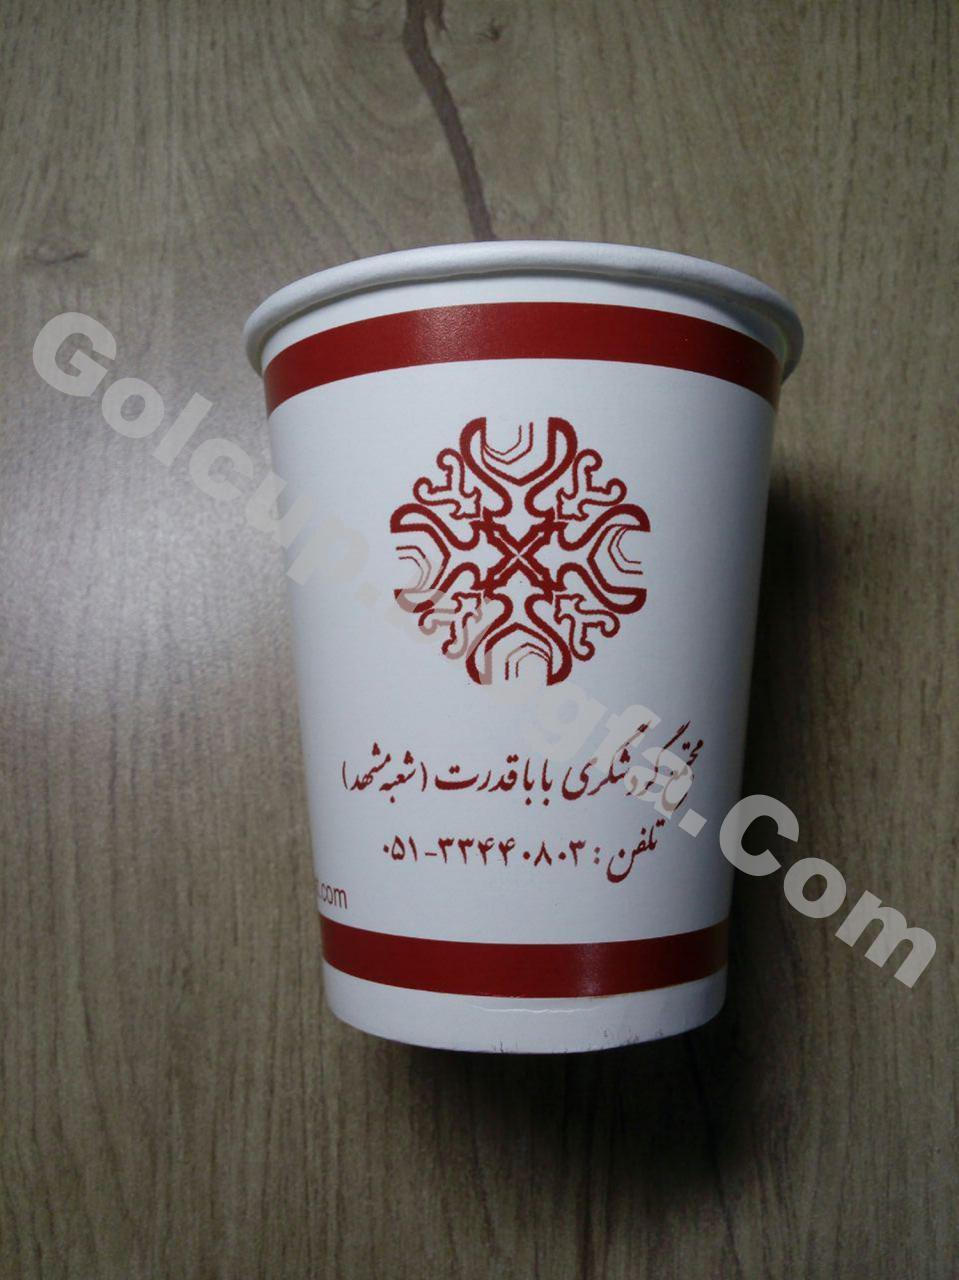 لیوان کاغذی گل کاپلیوان کاغذی. قیمت دستگاه تولید لیوان کاغذی